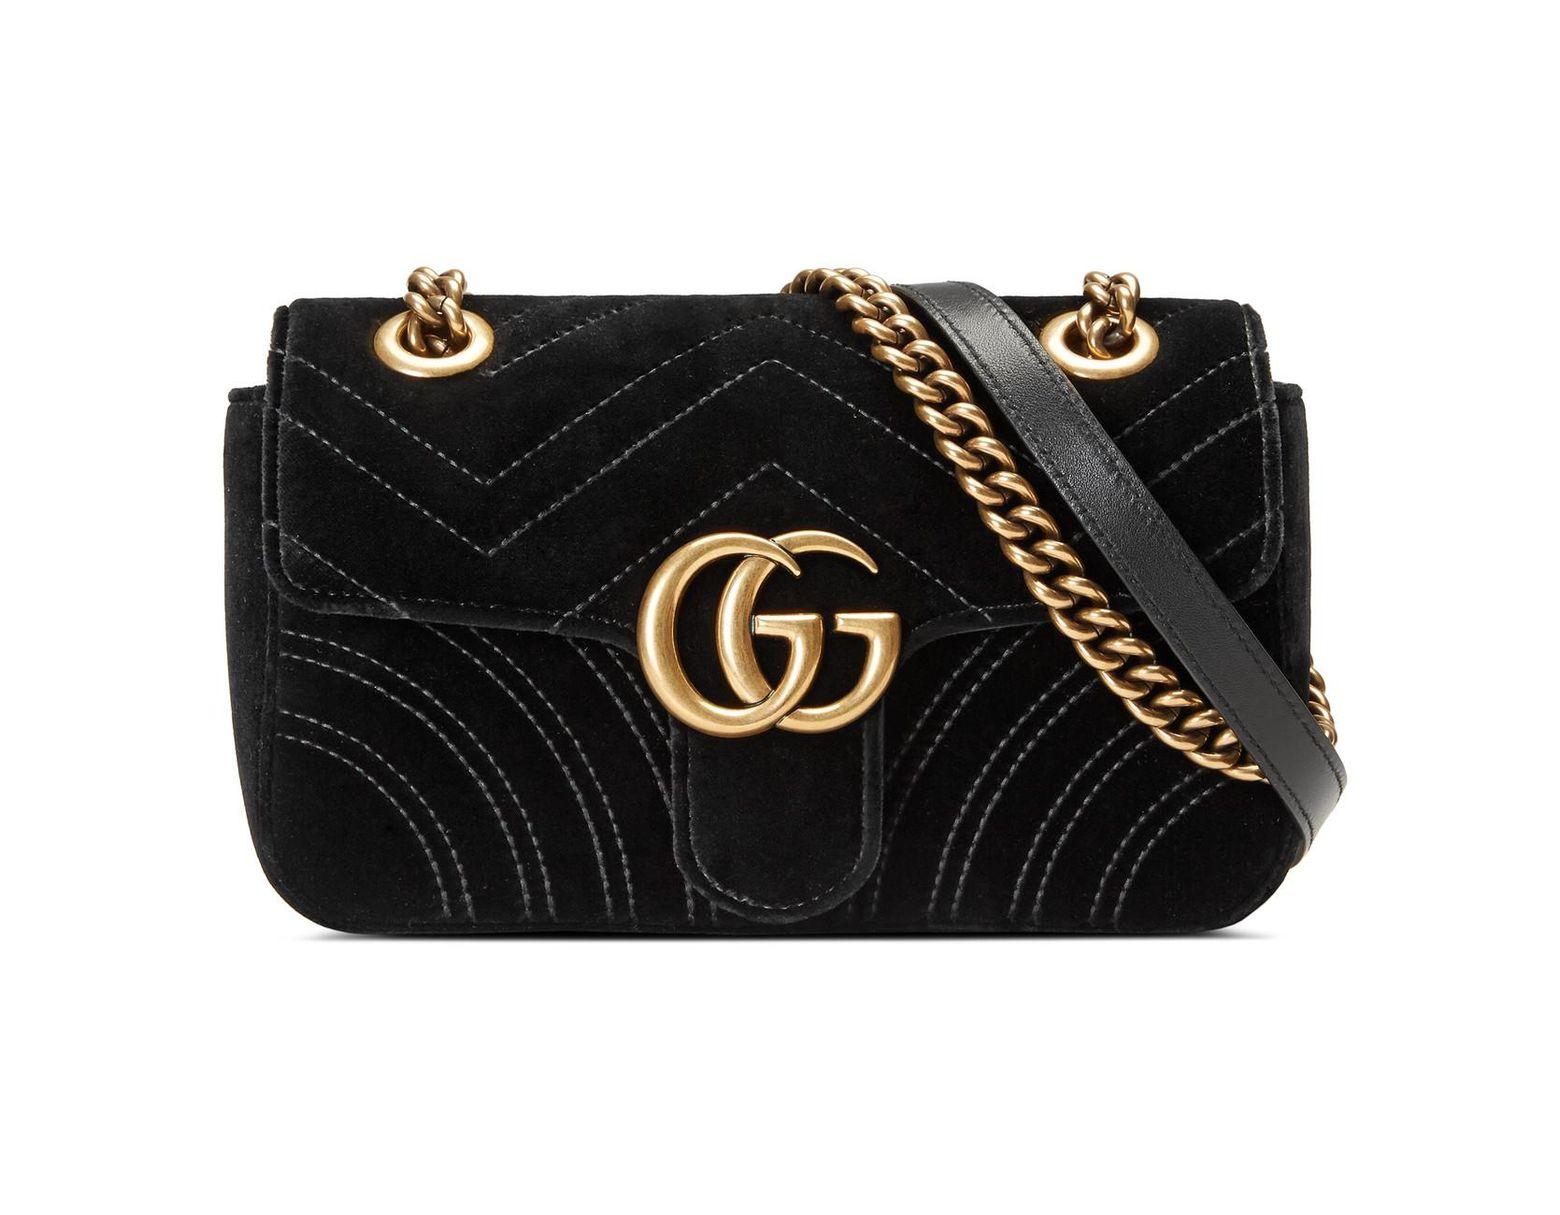 67a78b56ce98 Gucci GG Marmont Velvet Mini Shoulder Bag in Black - Lyst